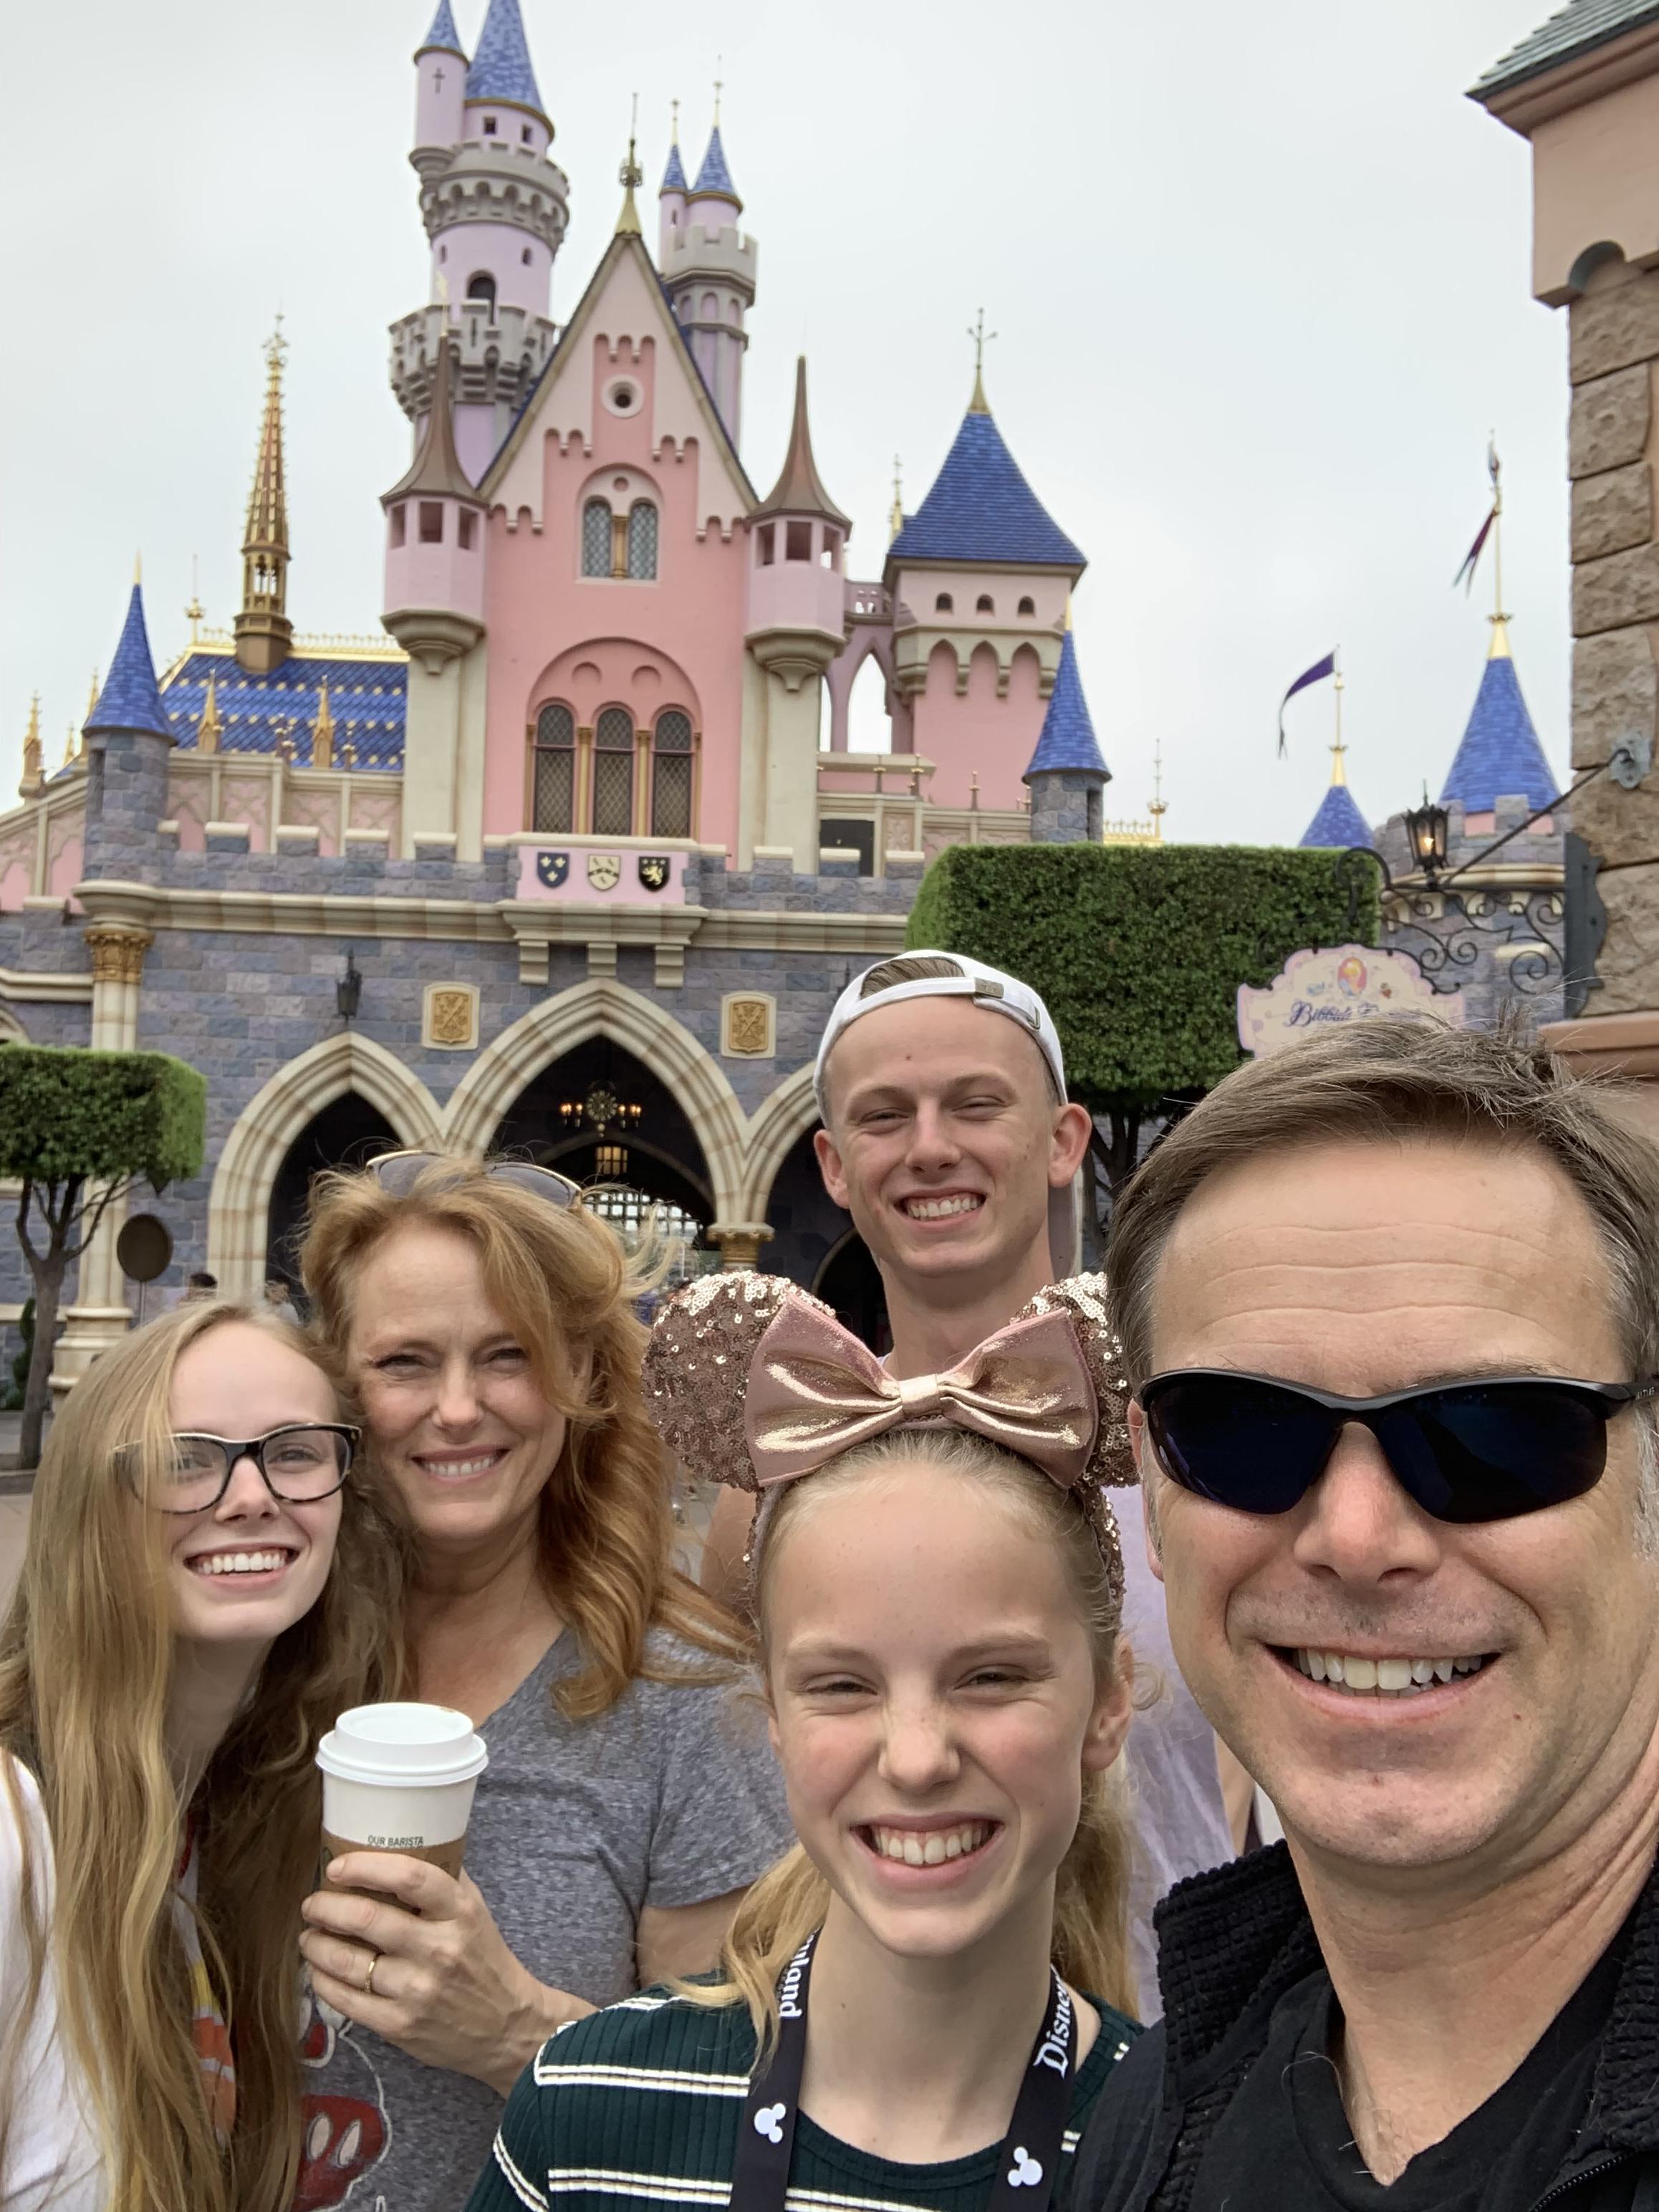 Family time at Disneyland.